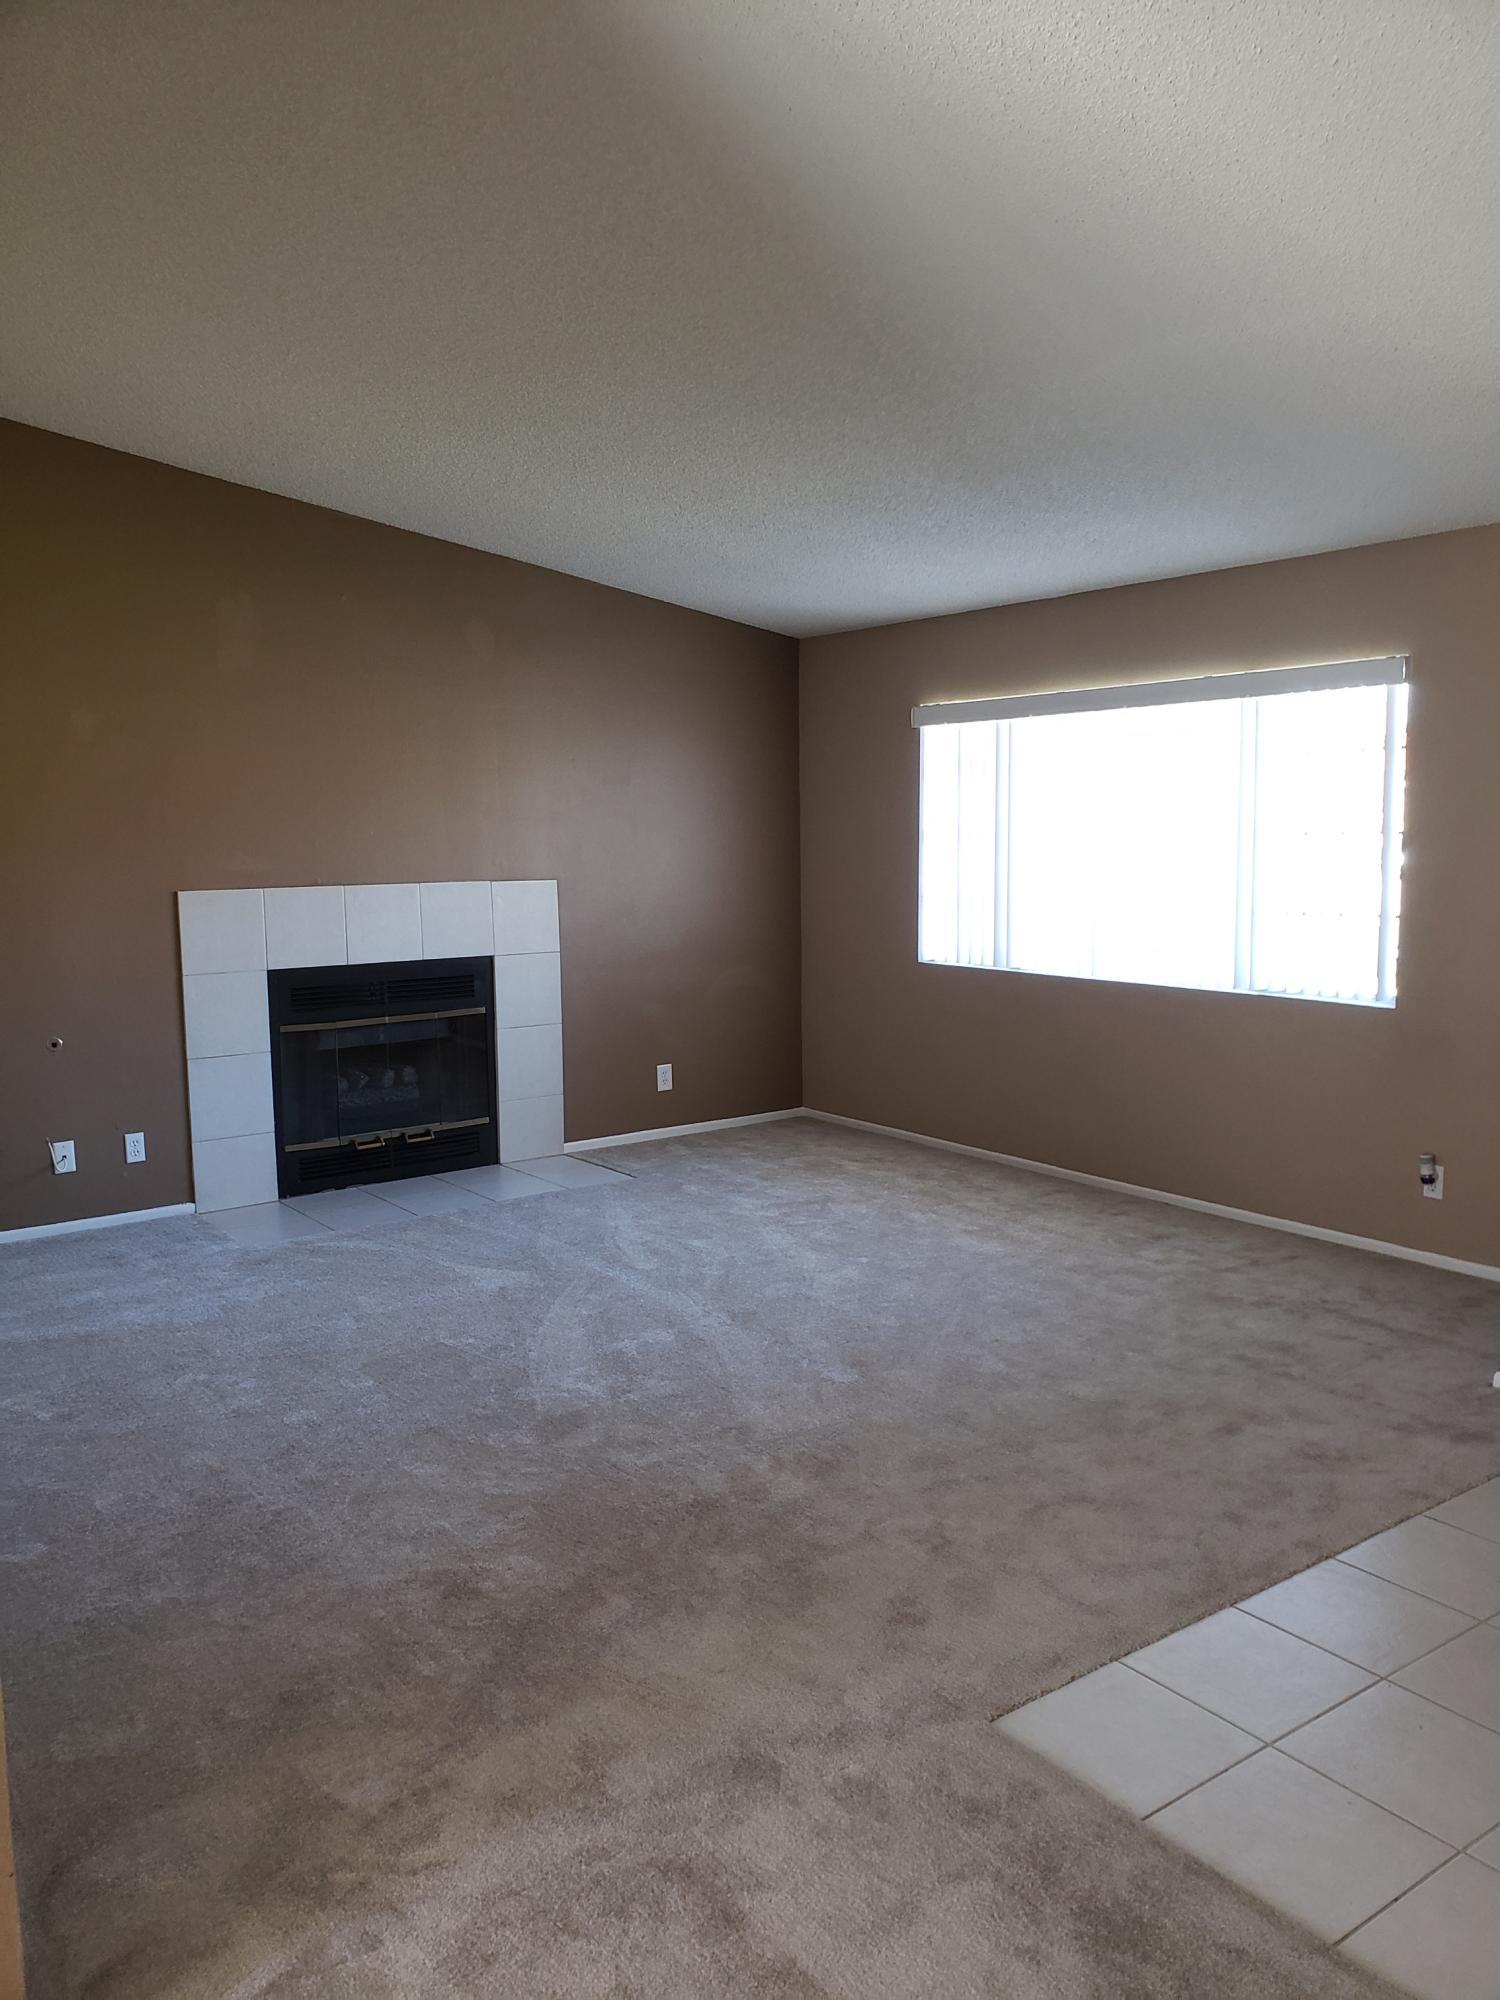 41800 Lima Hall Road, Bermuda Dunes, California 92203, 3 Bedrooms Bedrooms, ,2 BathroomsBathrooms,Residential,For Sale,41800 Lima Hall Road,219041086